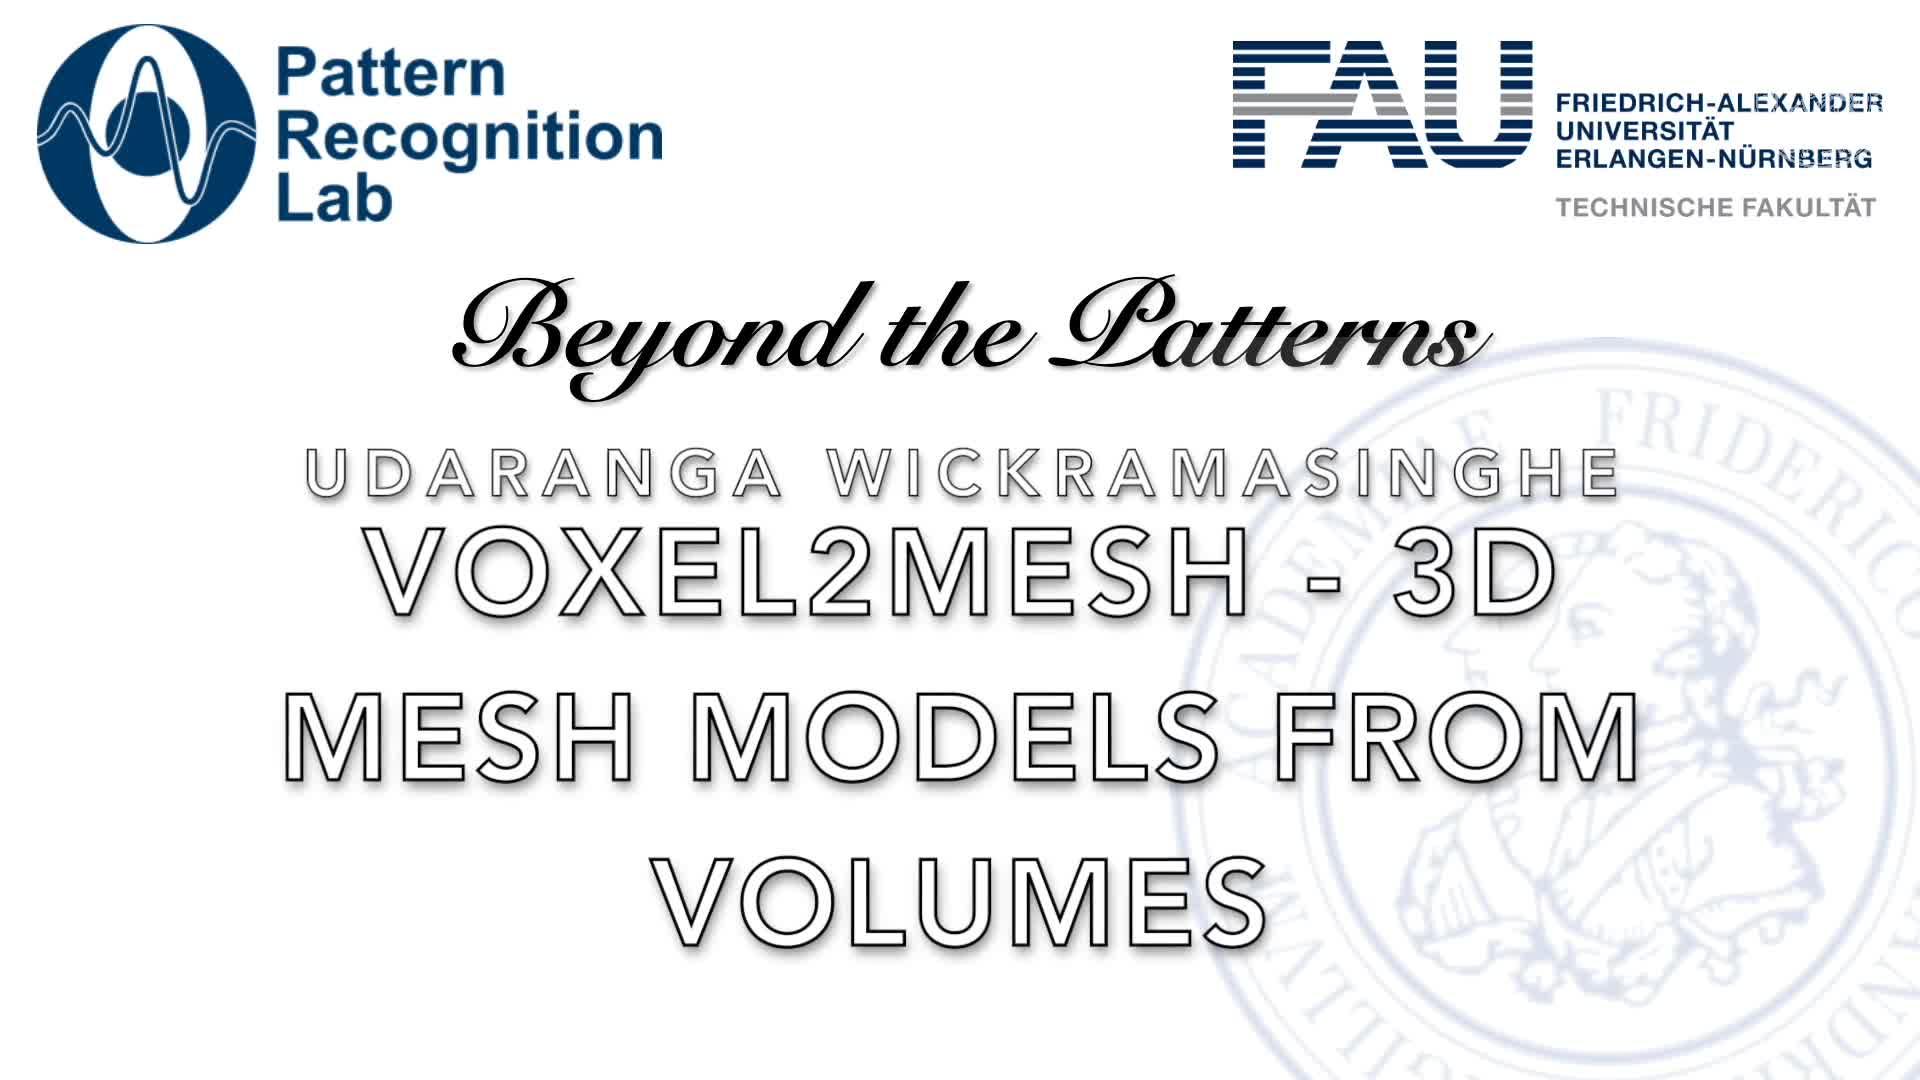 Beyond the Patterns - Udaranga Wickramasinghe - Voxel2Mesh: 3D Mesh Model Generation from Volumetric Data preview image